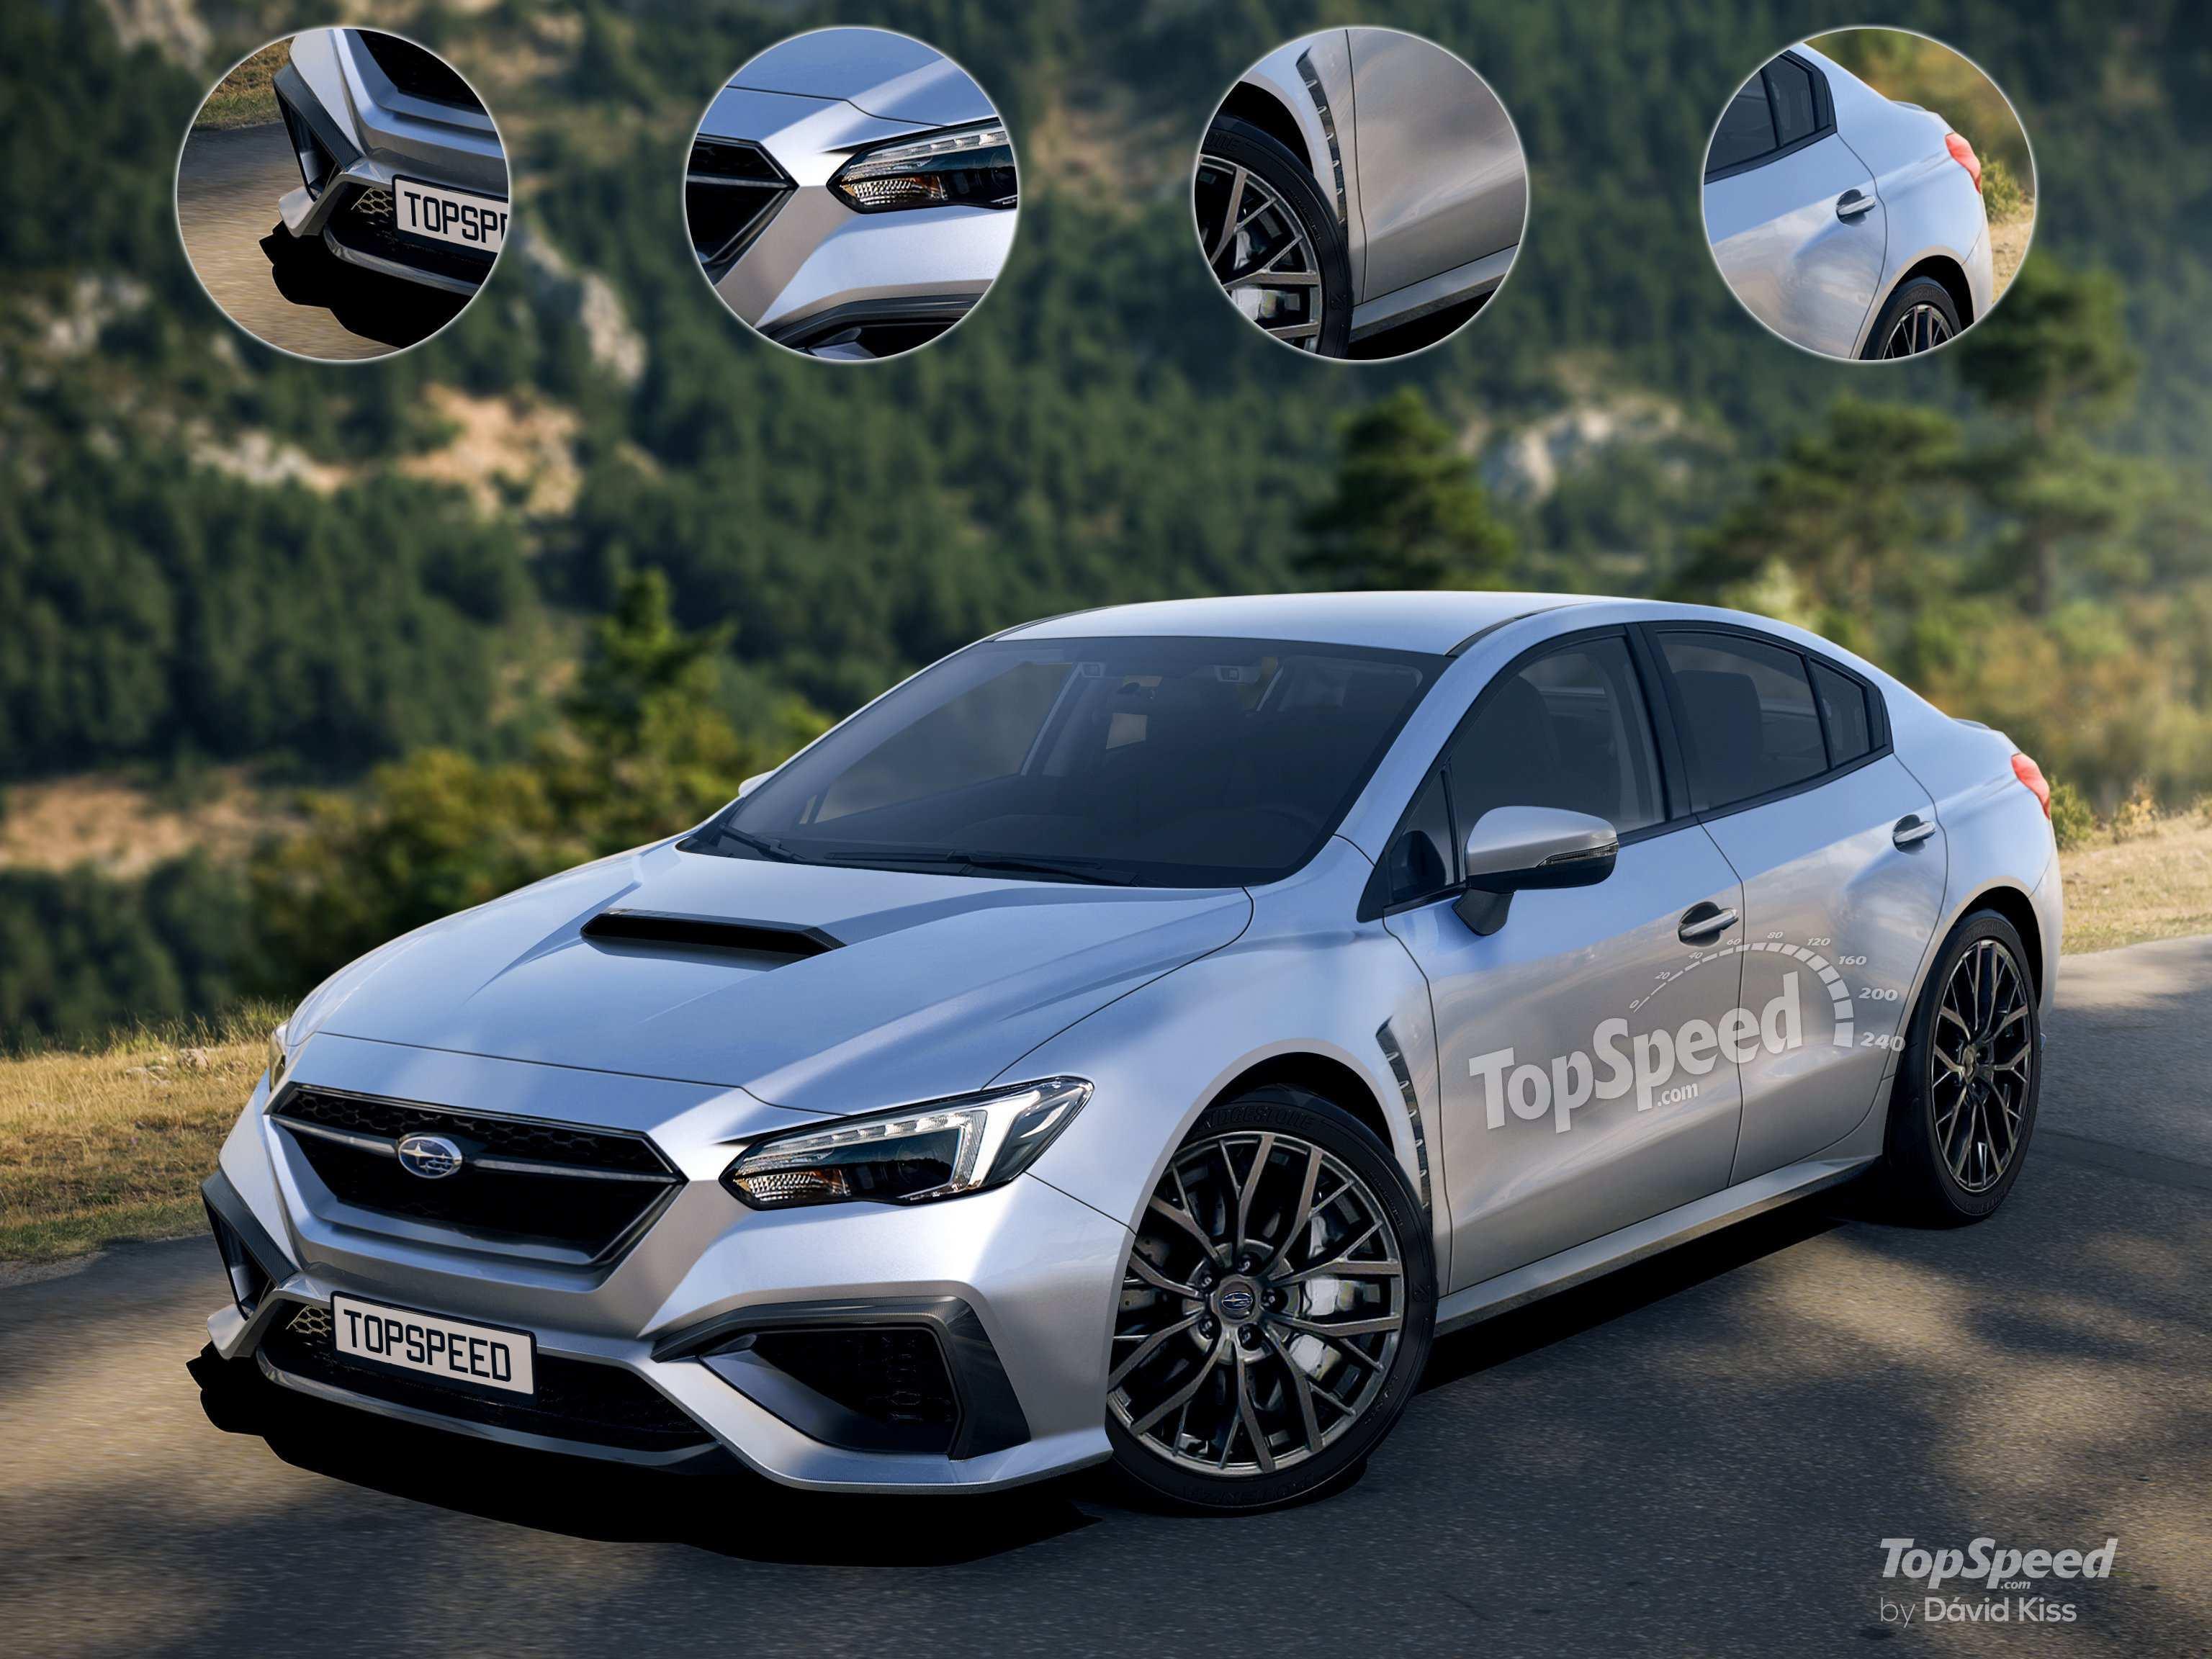 77 Gallery of 2020 Subaru Wrx Sti Review Research New with 2020 Subaru Wrx Sti Review